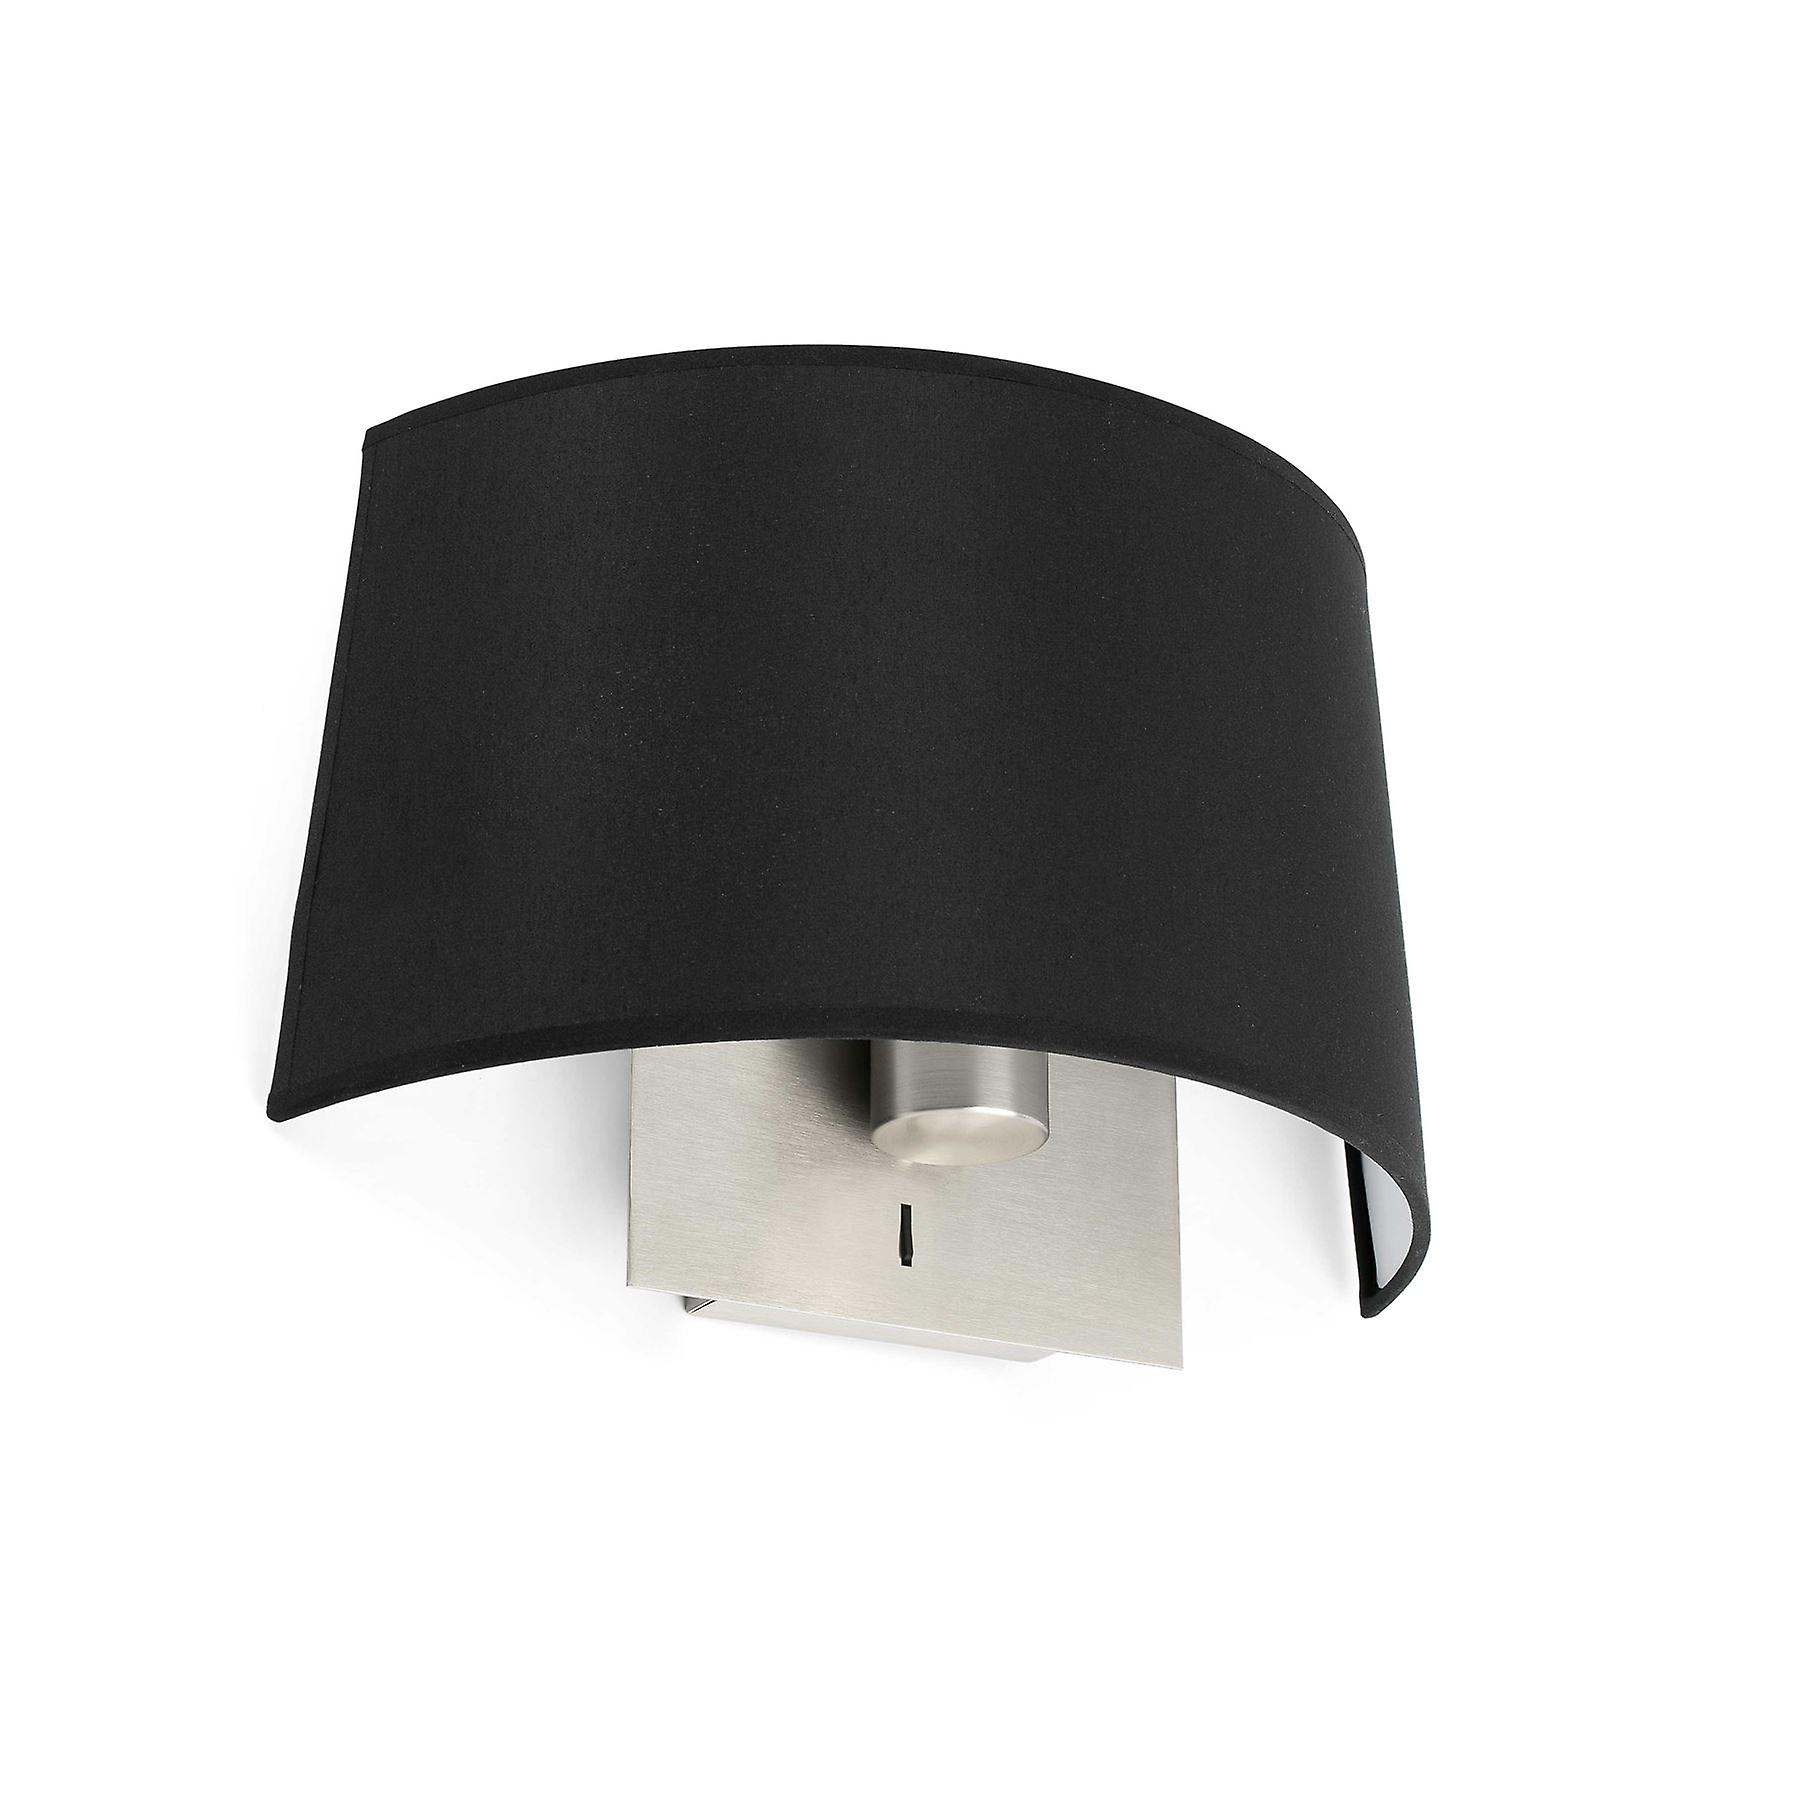 Faro - Volta Satin Nickel And noir Wall Lamp FARO20022